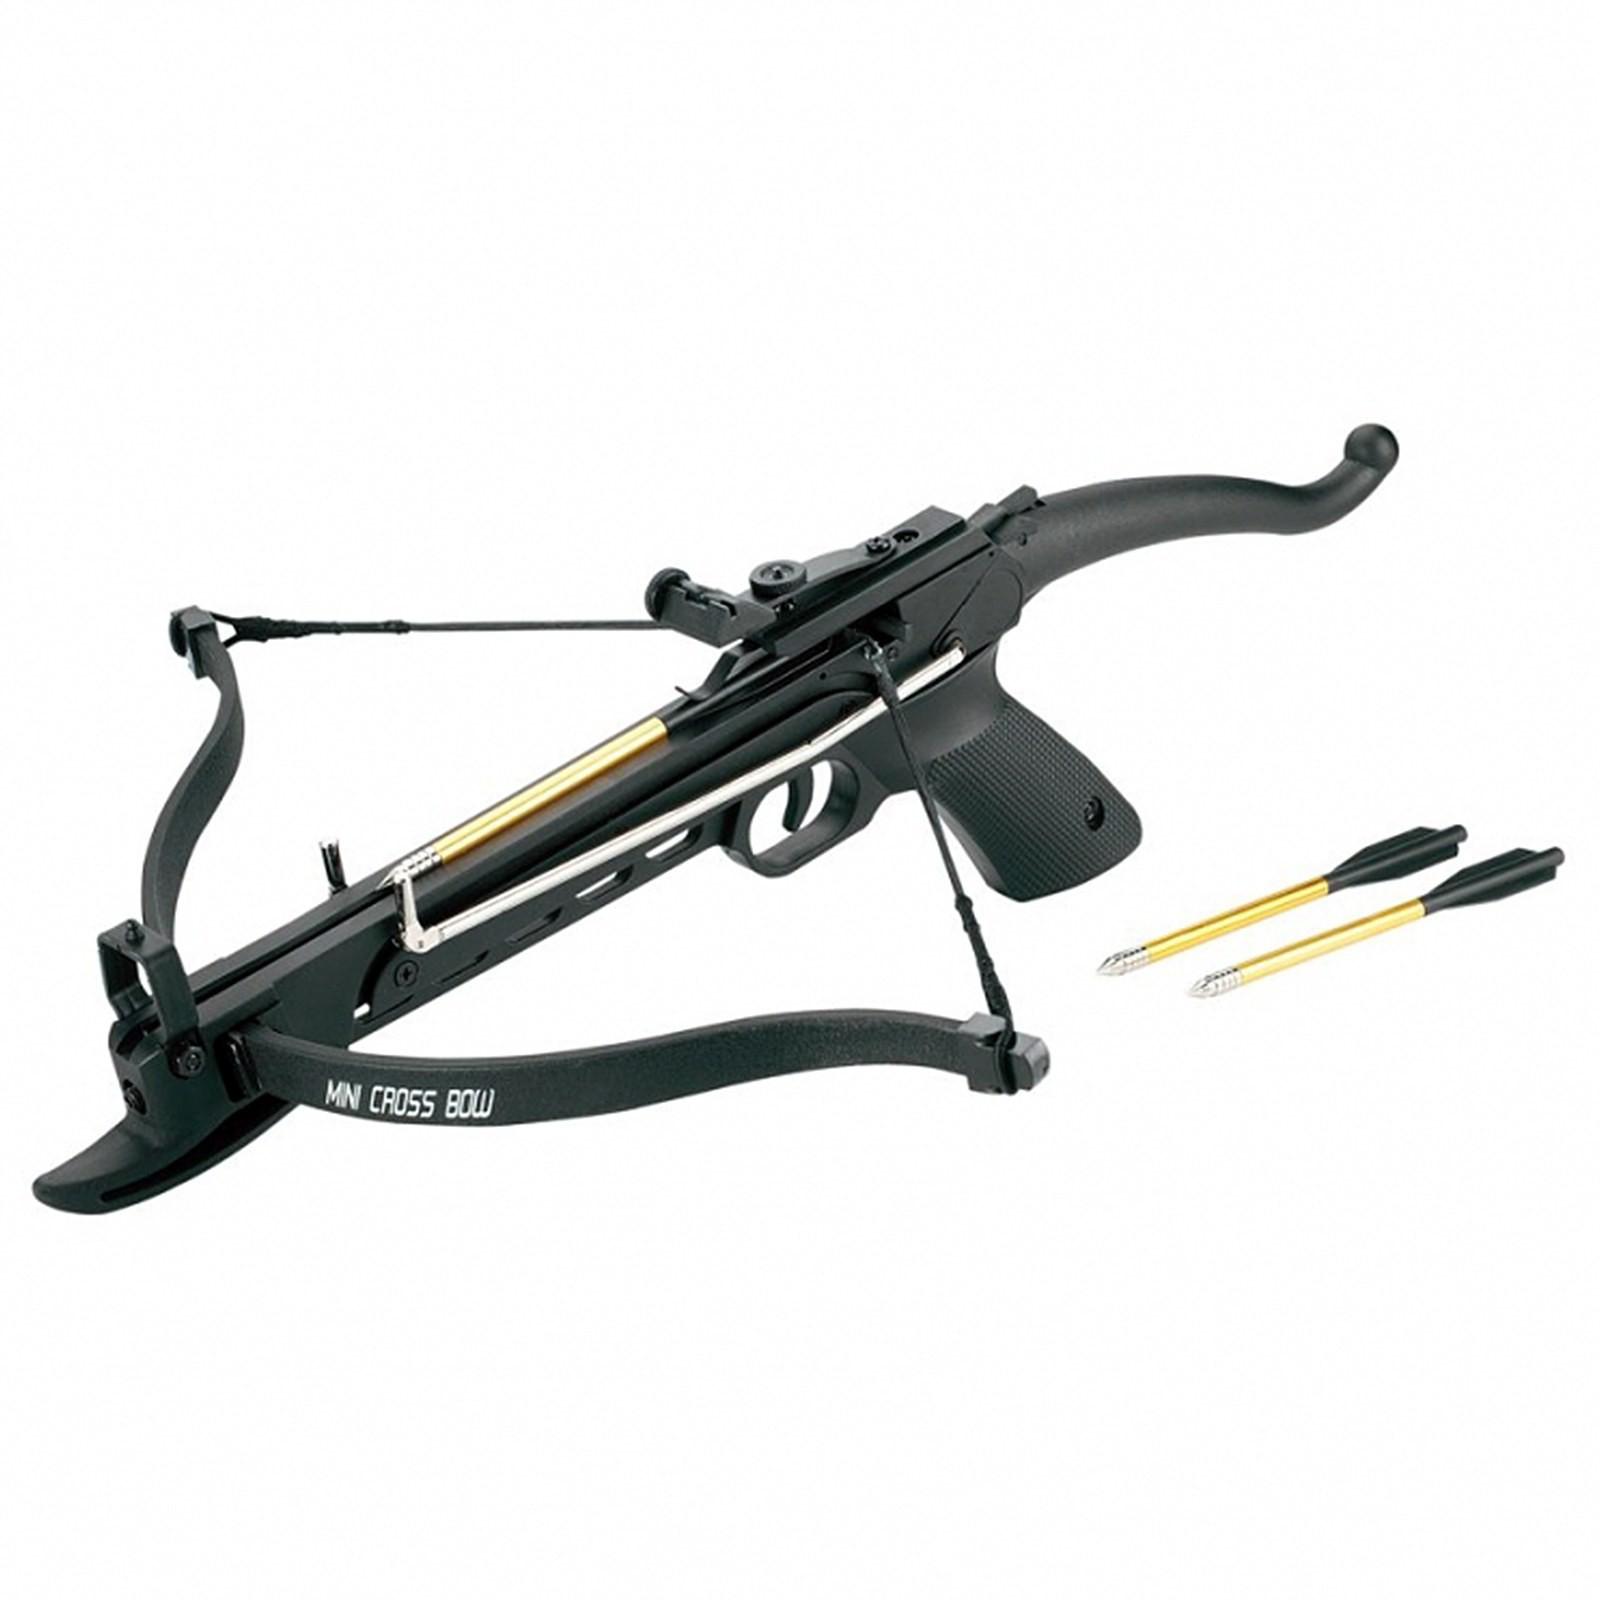 Balestra Professionale a Pistola 80 Libbre Royal MK-80A4PL